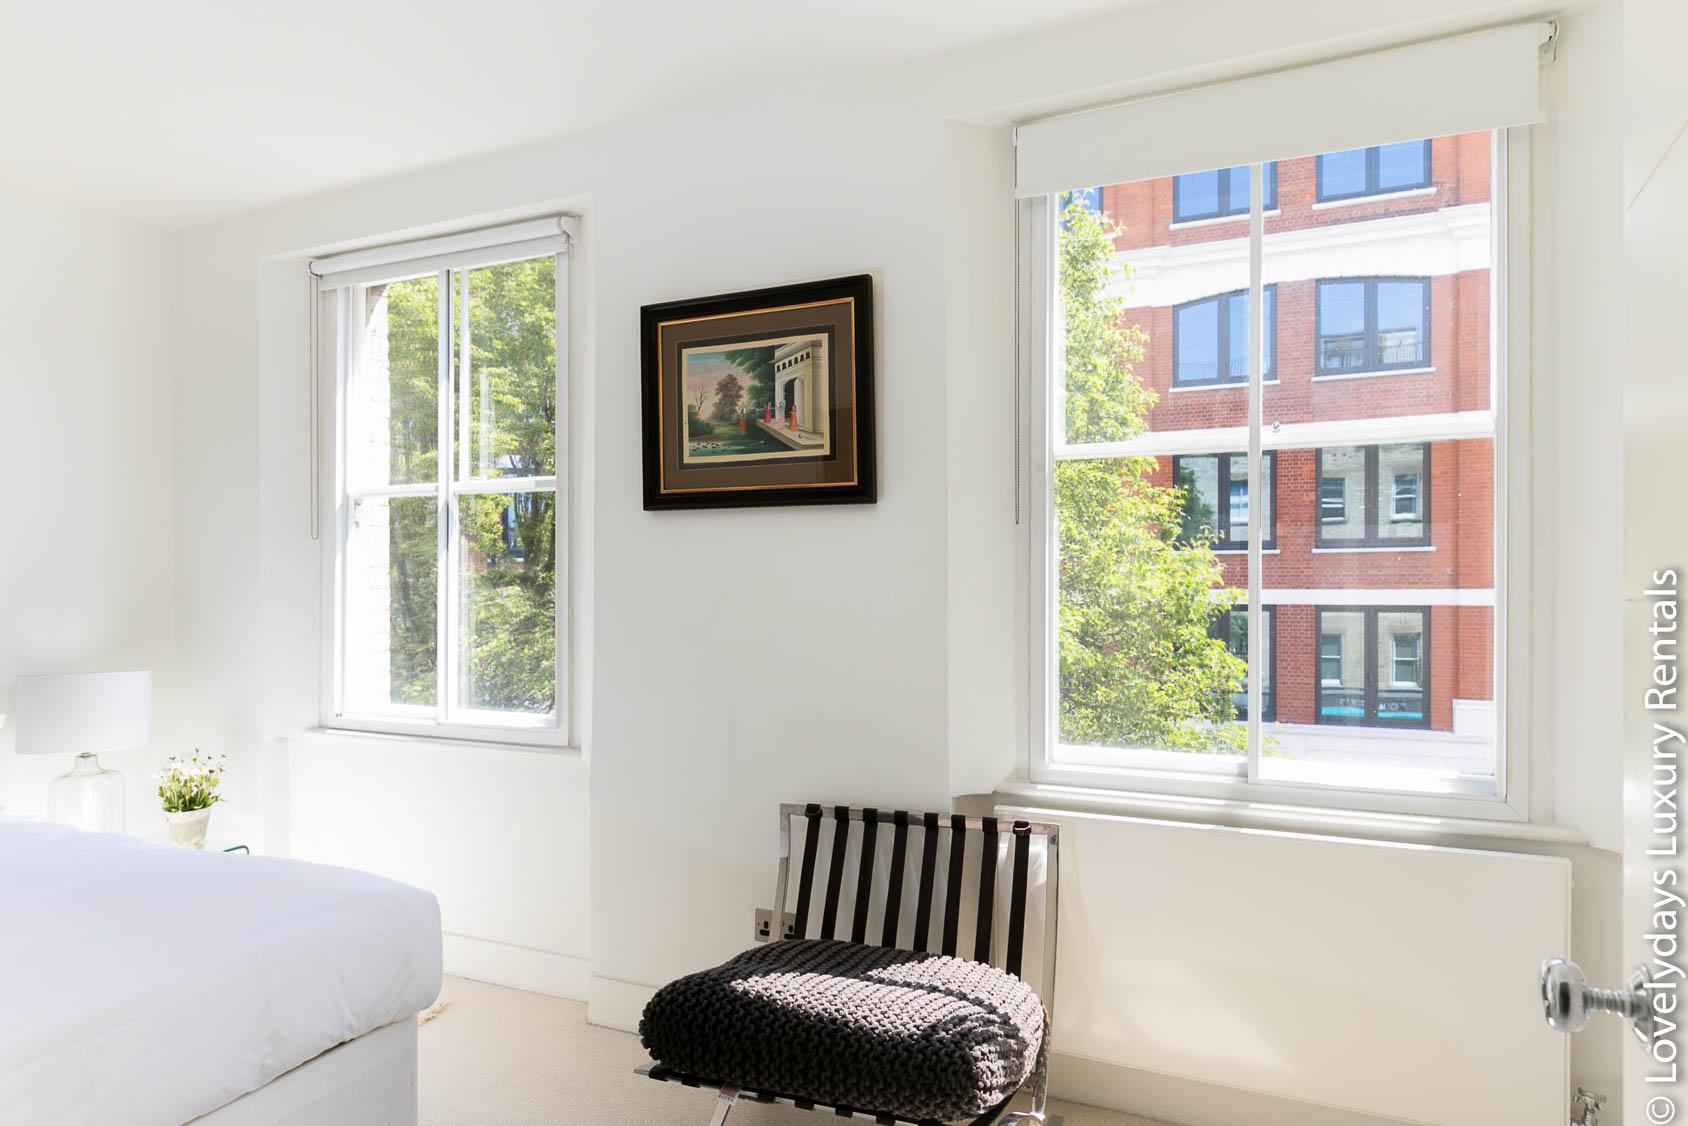 Lovelydays luxury service apartment rental - London - Fitzrovia - Foley Street - Lovelysuite - 2 bedrooms - 2 bathrooms - Lovely view - 116e4e3eb13c - Lovelydays